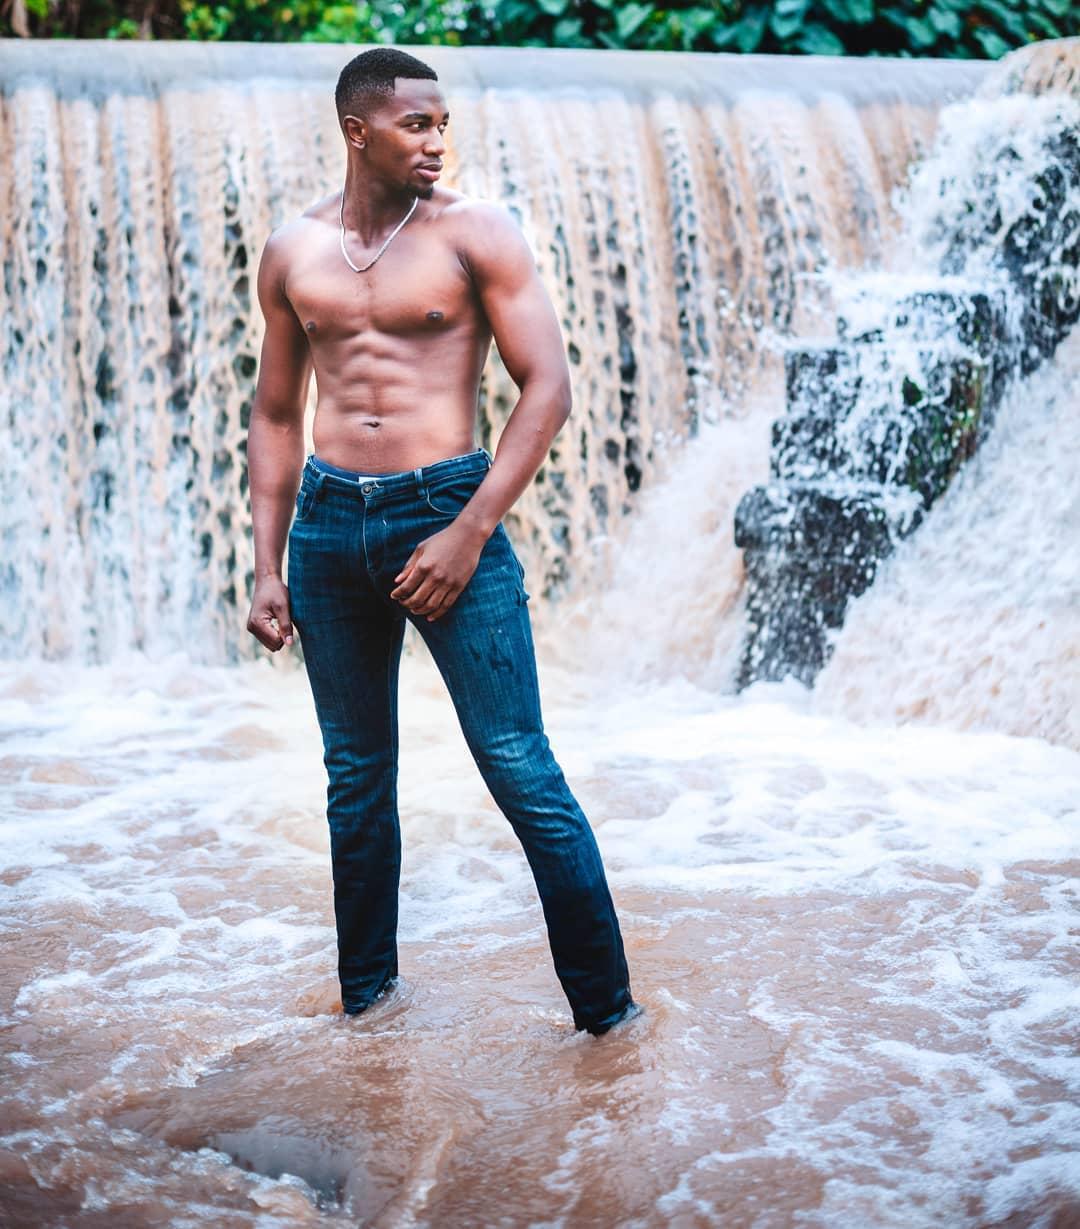 Franklyne Asoyo - Mr World Kenya 2019 - 2021